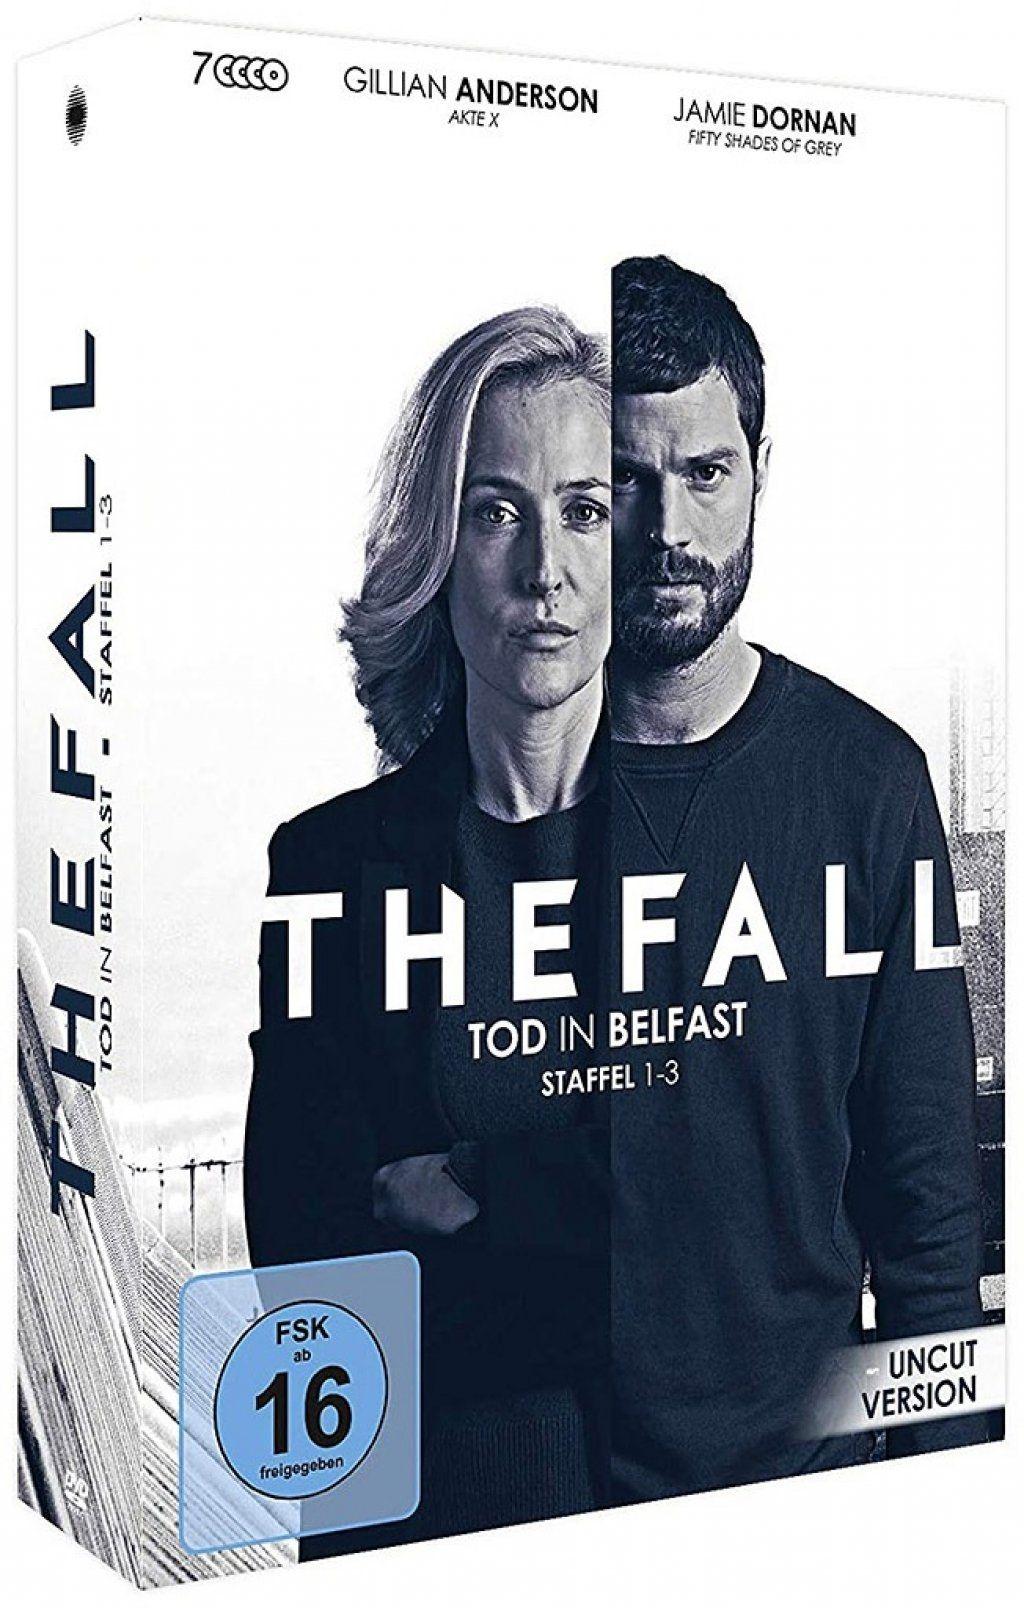 Fall, The - Tod in Belfast - Staffel 1-3 (7 Discs)